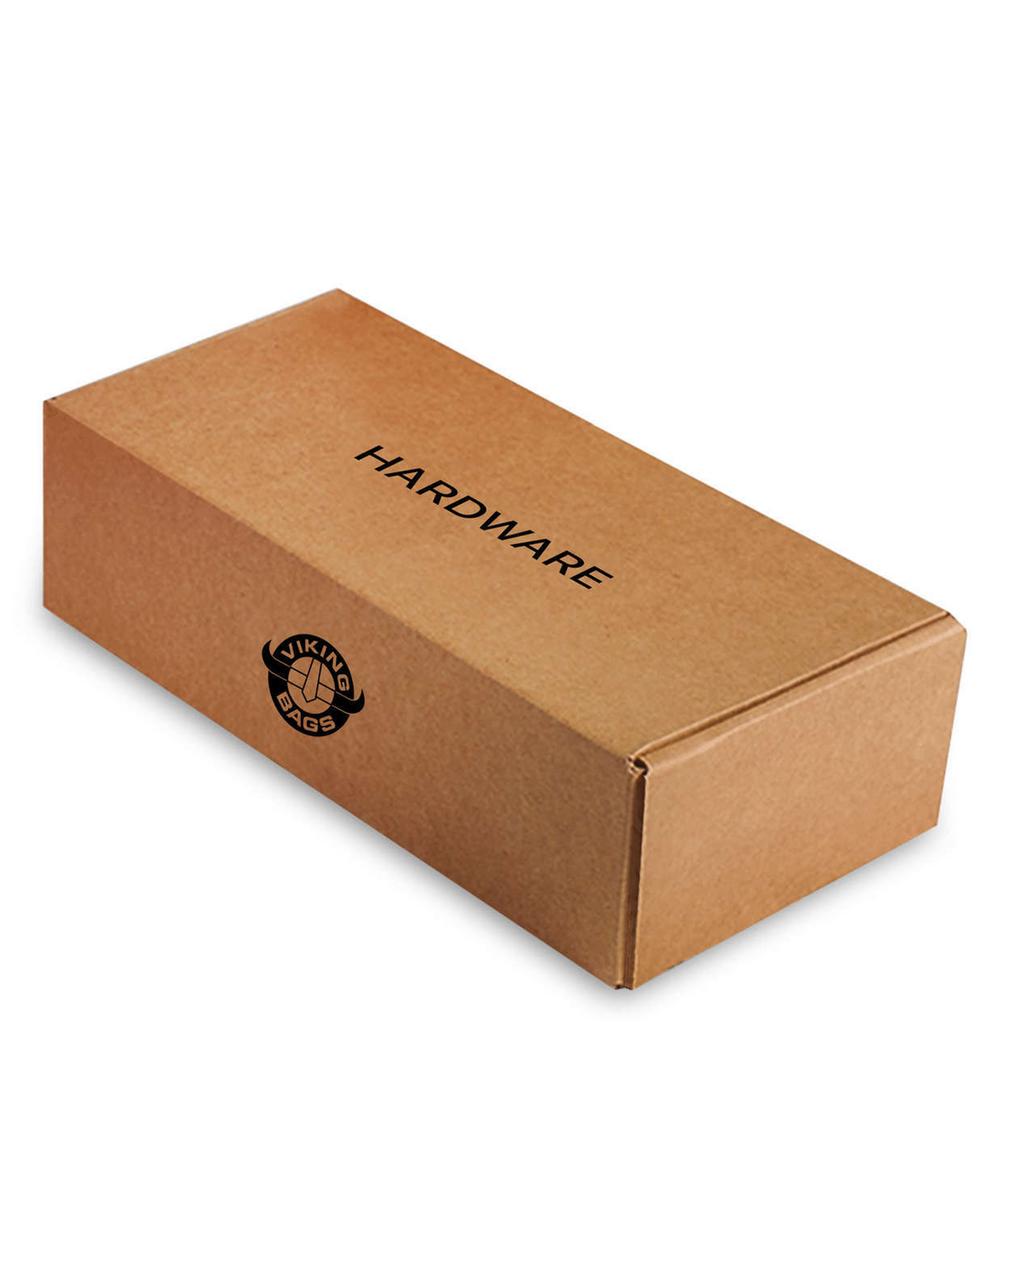 Kawasaki BN 125, Eliminator 125 Warrior Series Saddle bags Hardware Box